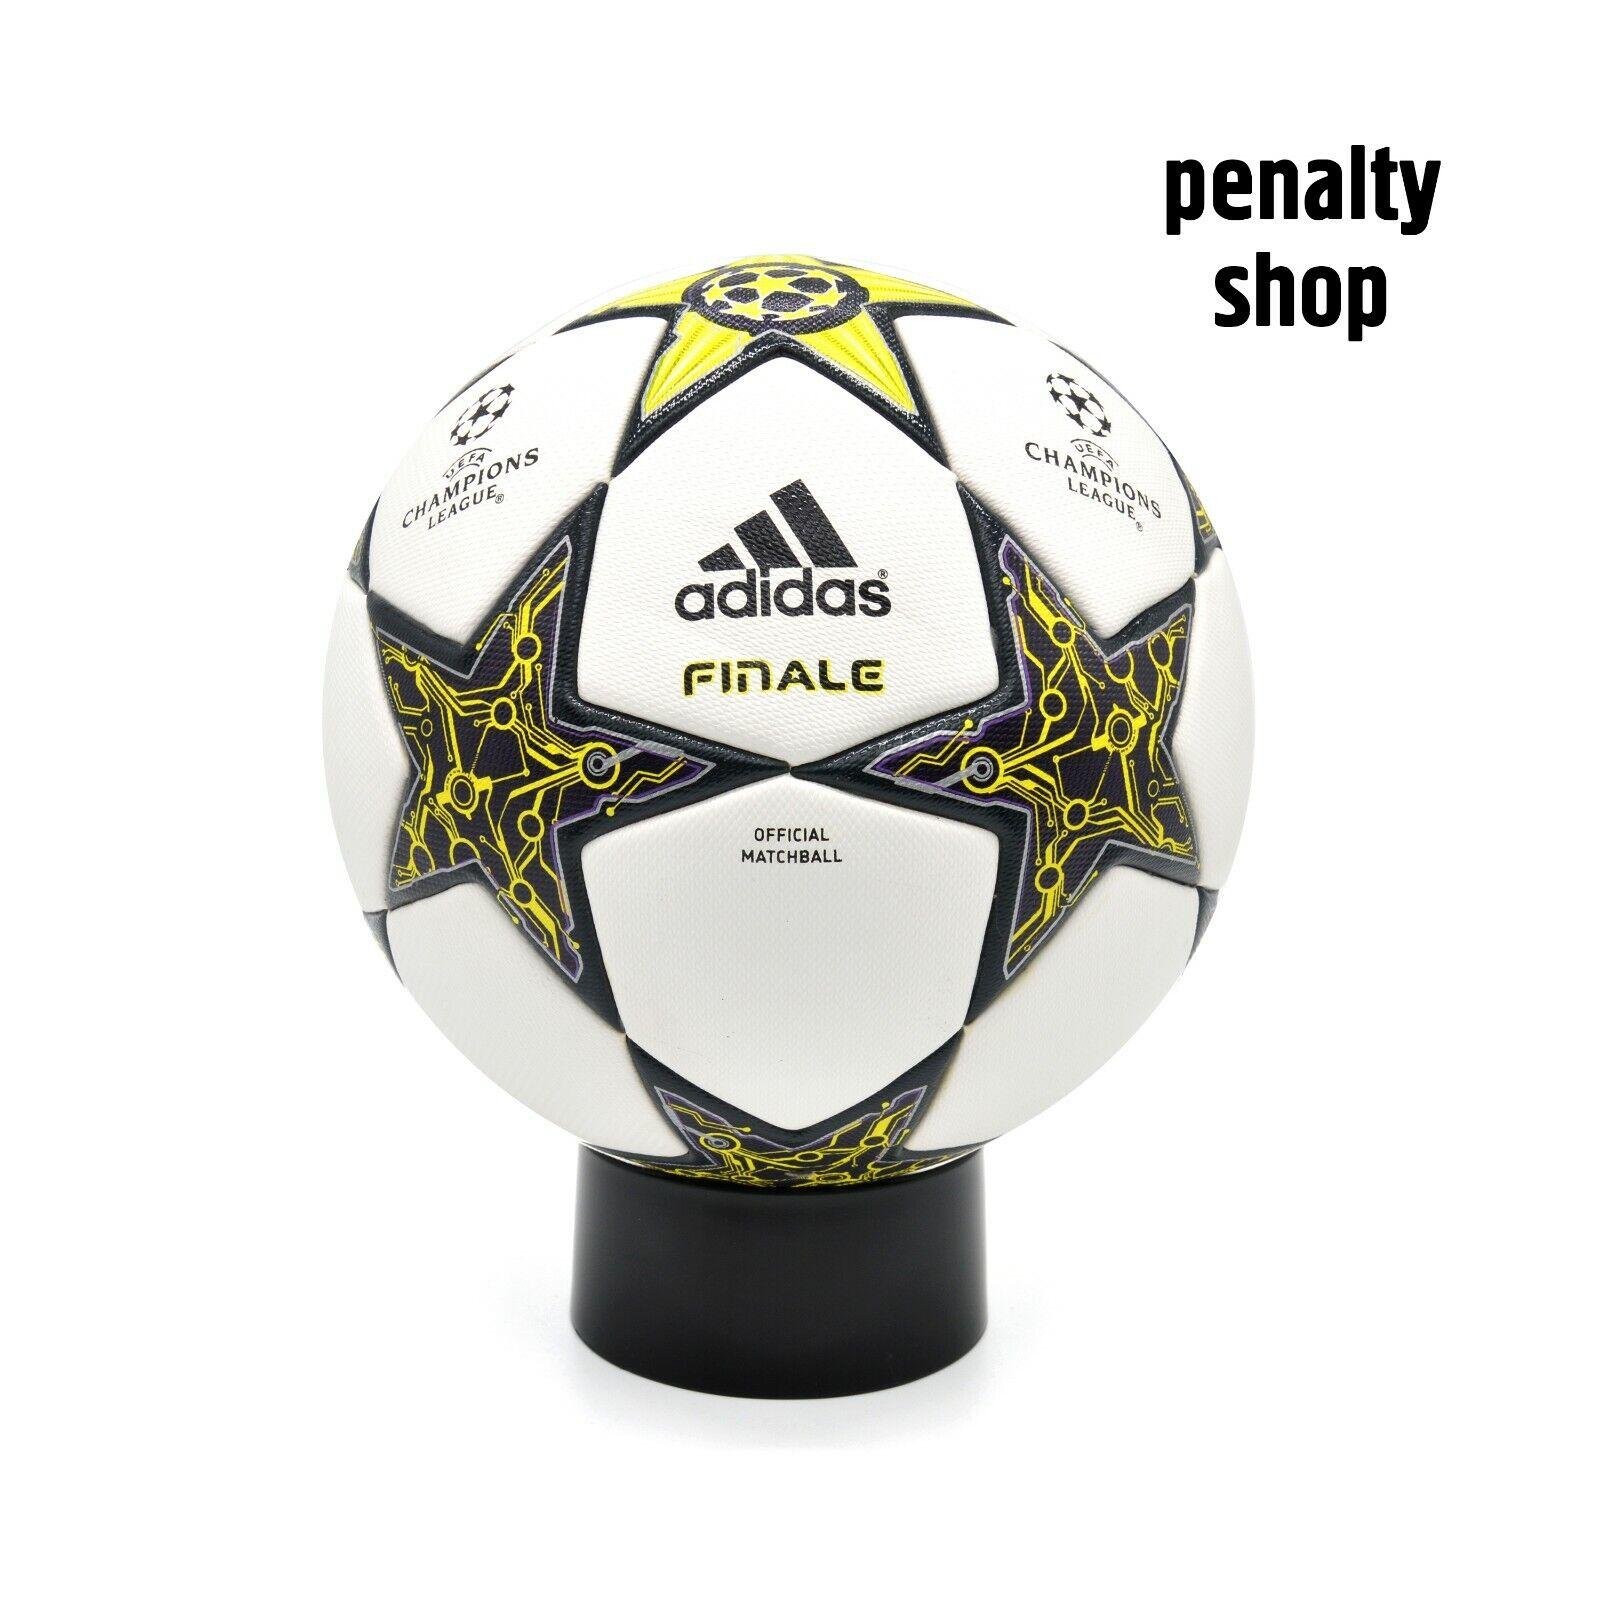 Adidas Finale 12 UEFA Champions League balón oficial W43107 Rara